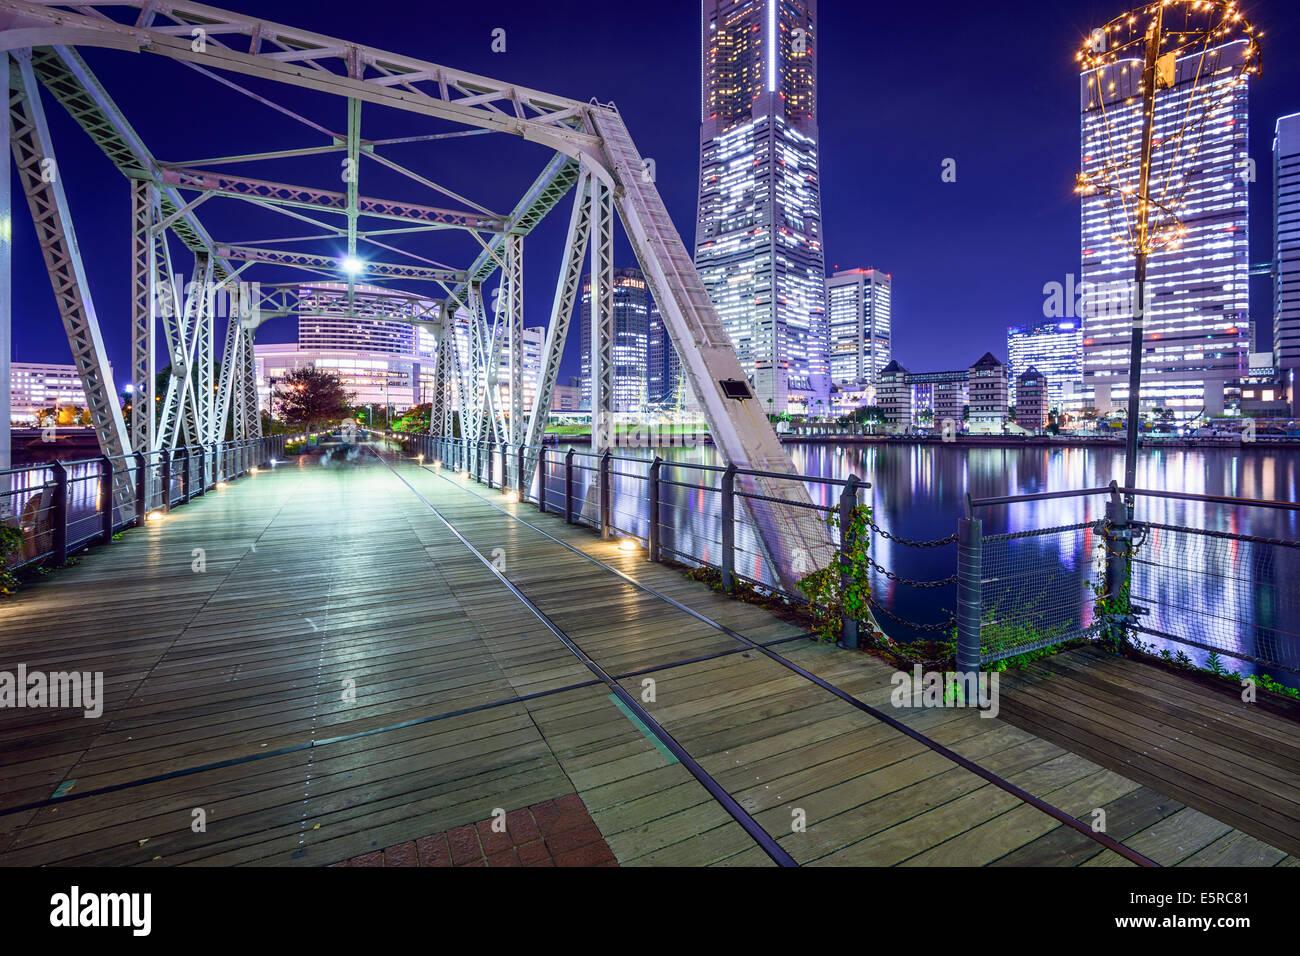 Yokohama, Japan at Minato Mirai park and pedestrian bridge. - Stock Image